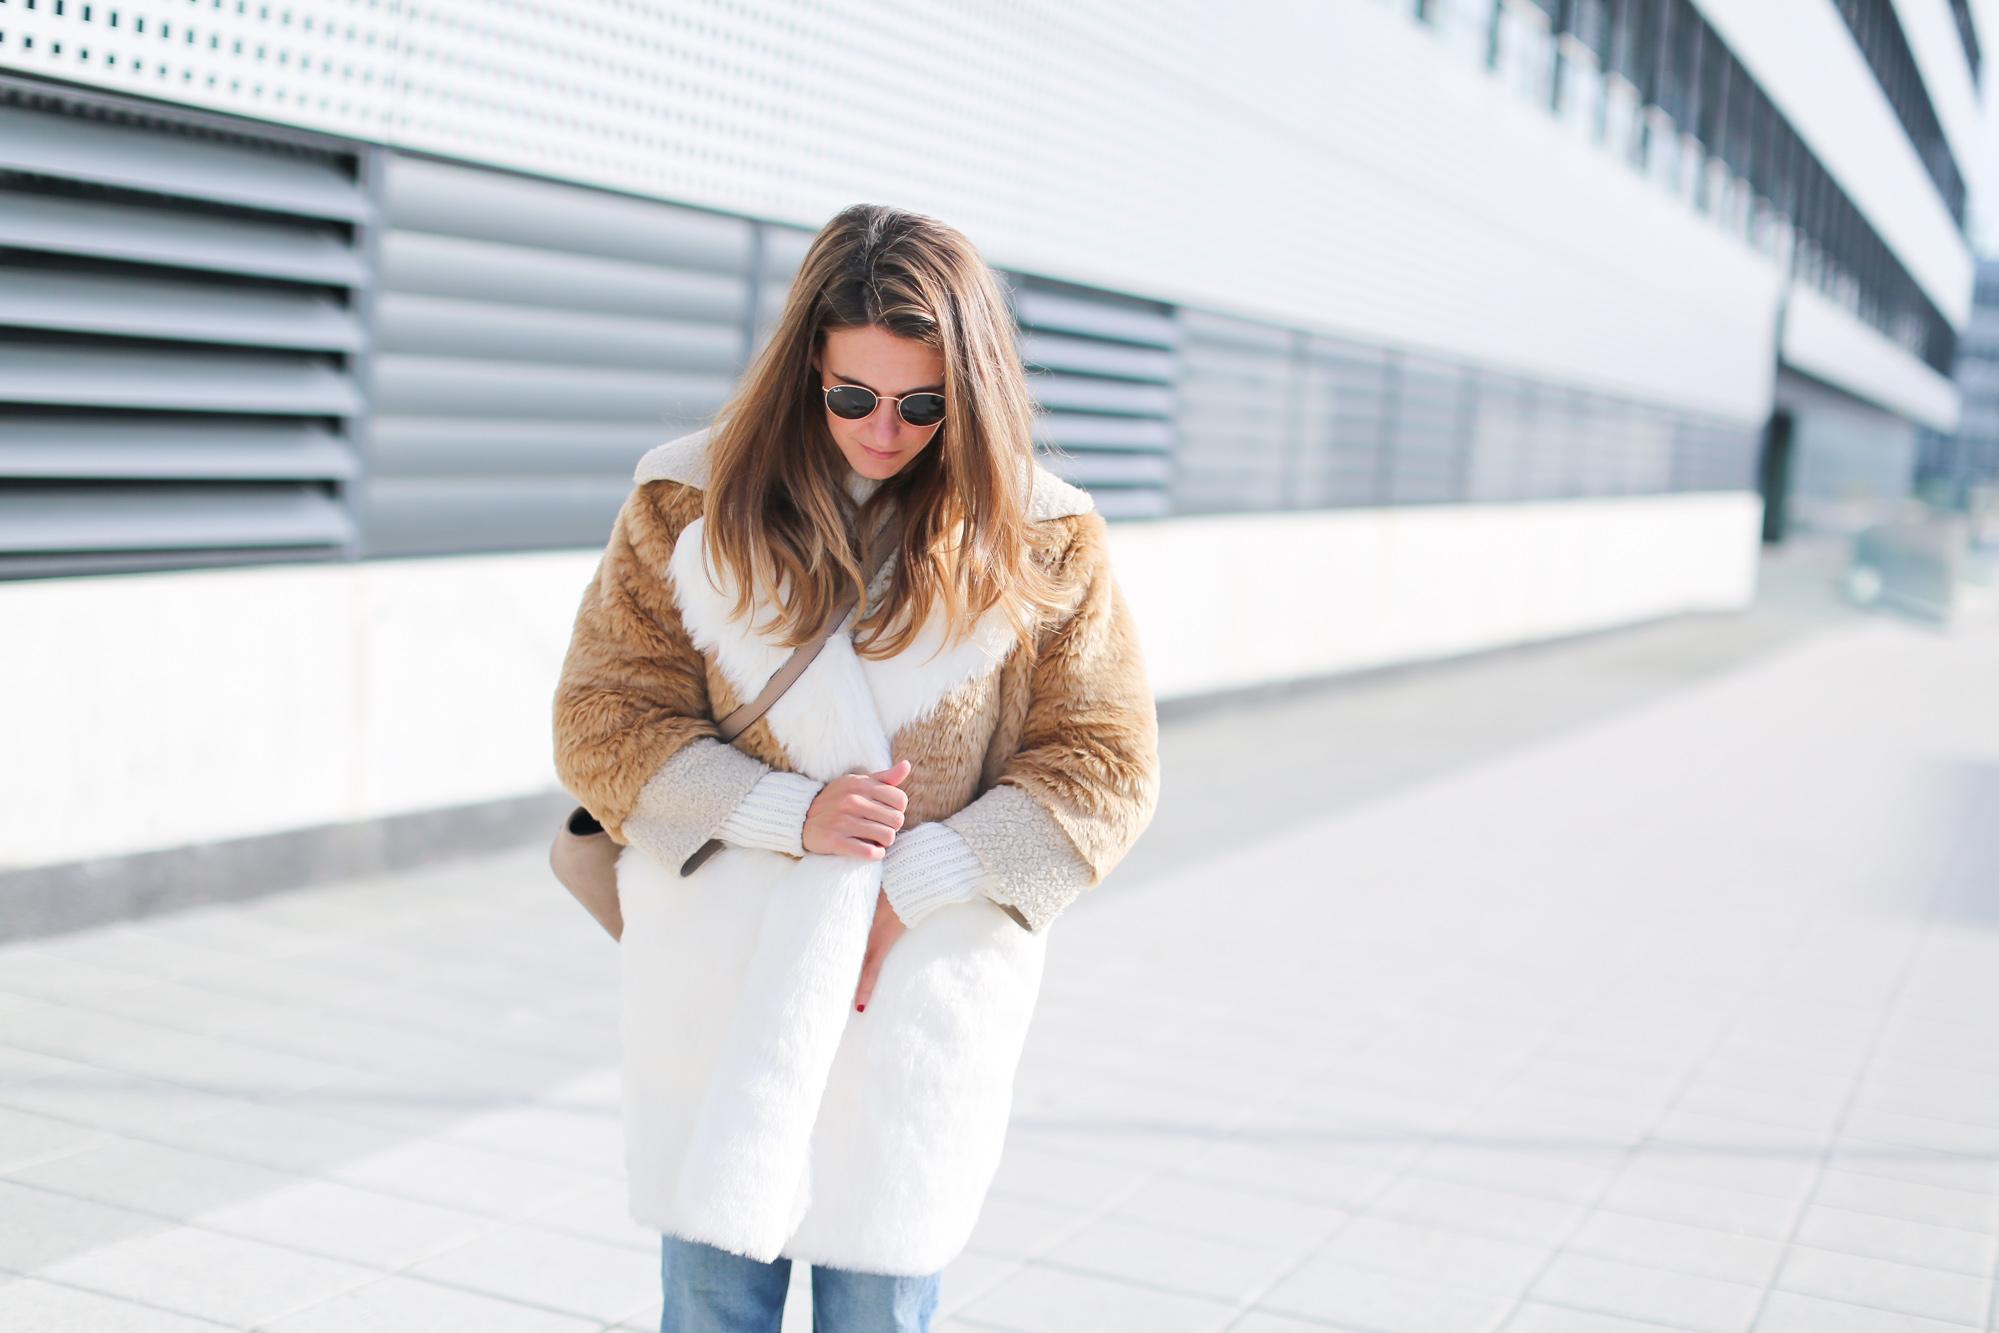 Clochet_streetstyle_fashionblogger_asosfauxfurteddycoat_pinkadidashamburg_leztinstreet_acnestudiosjeans_pop-4